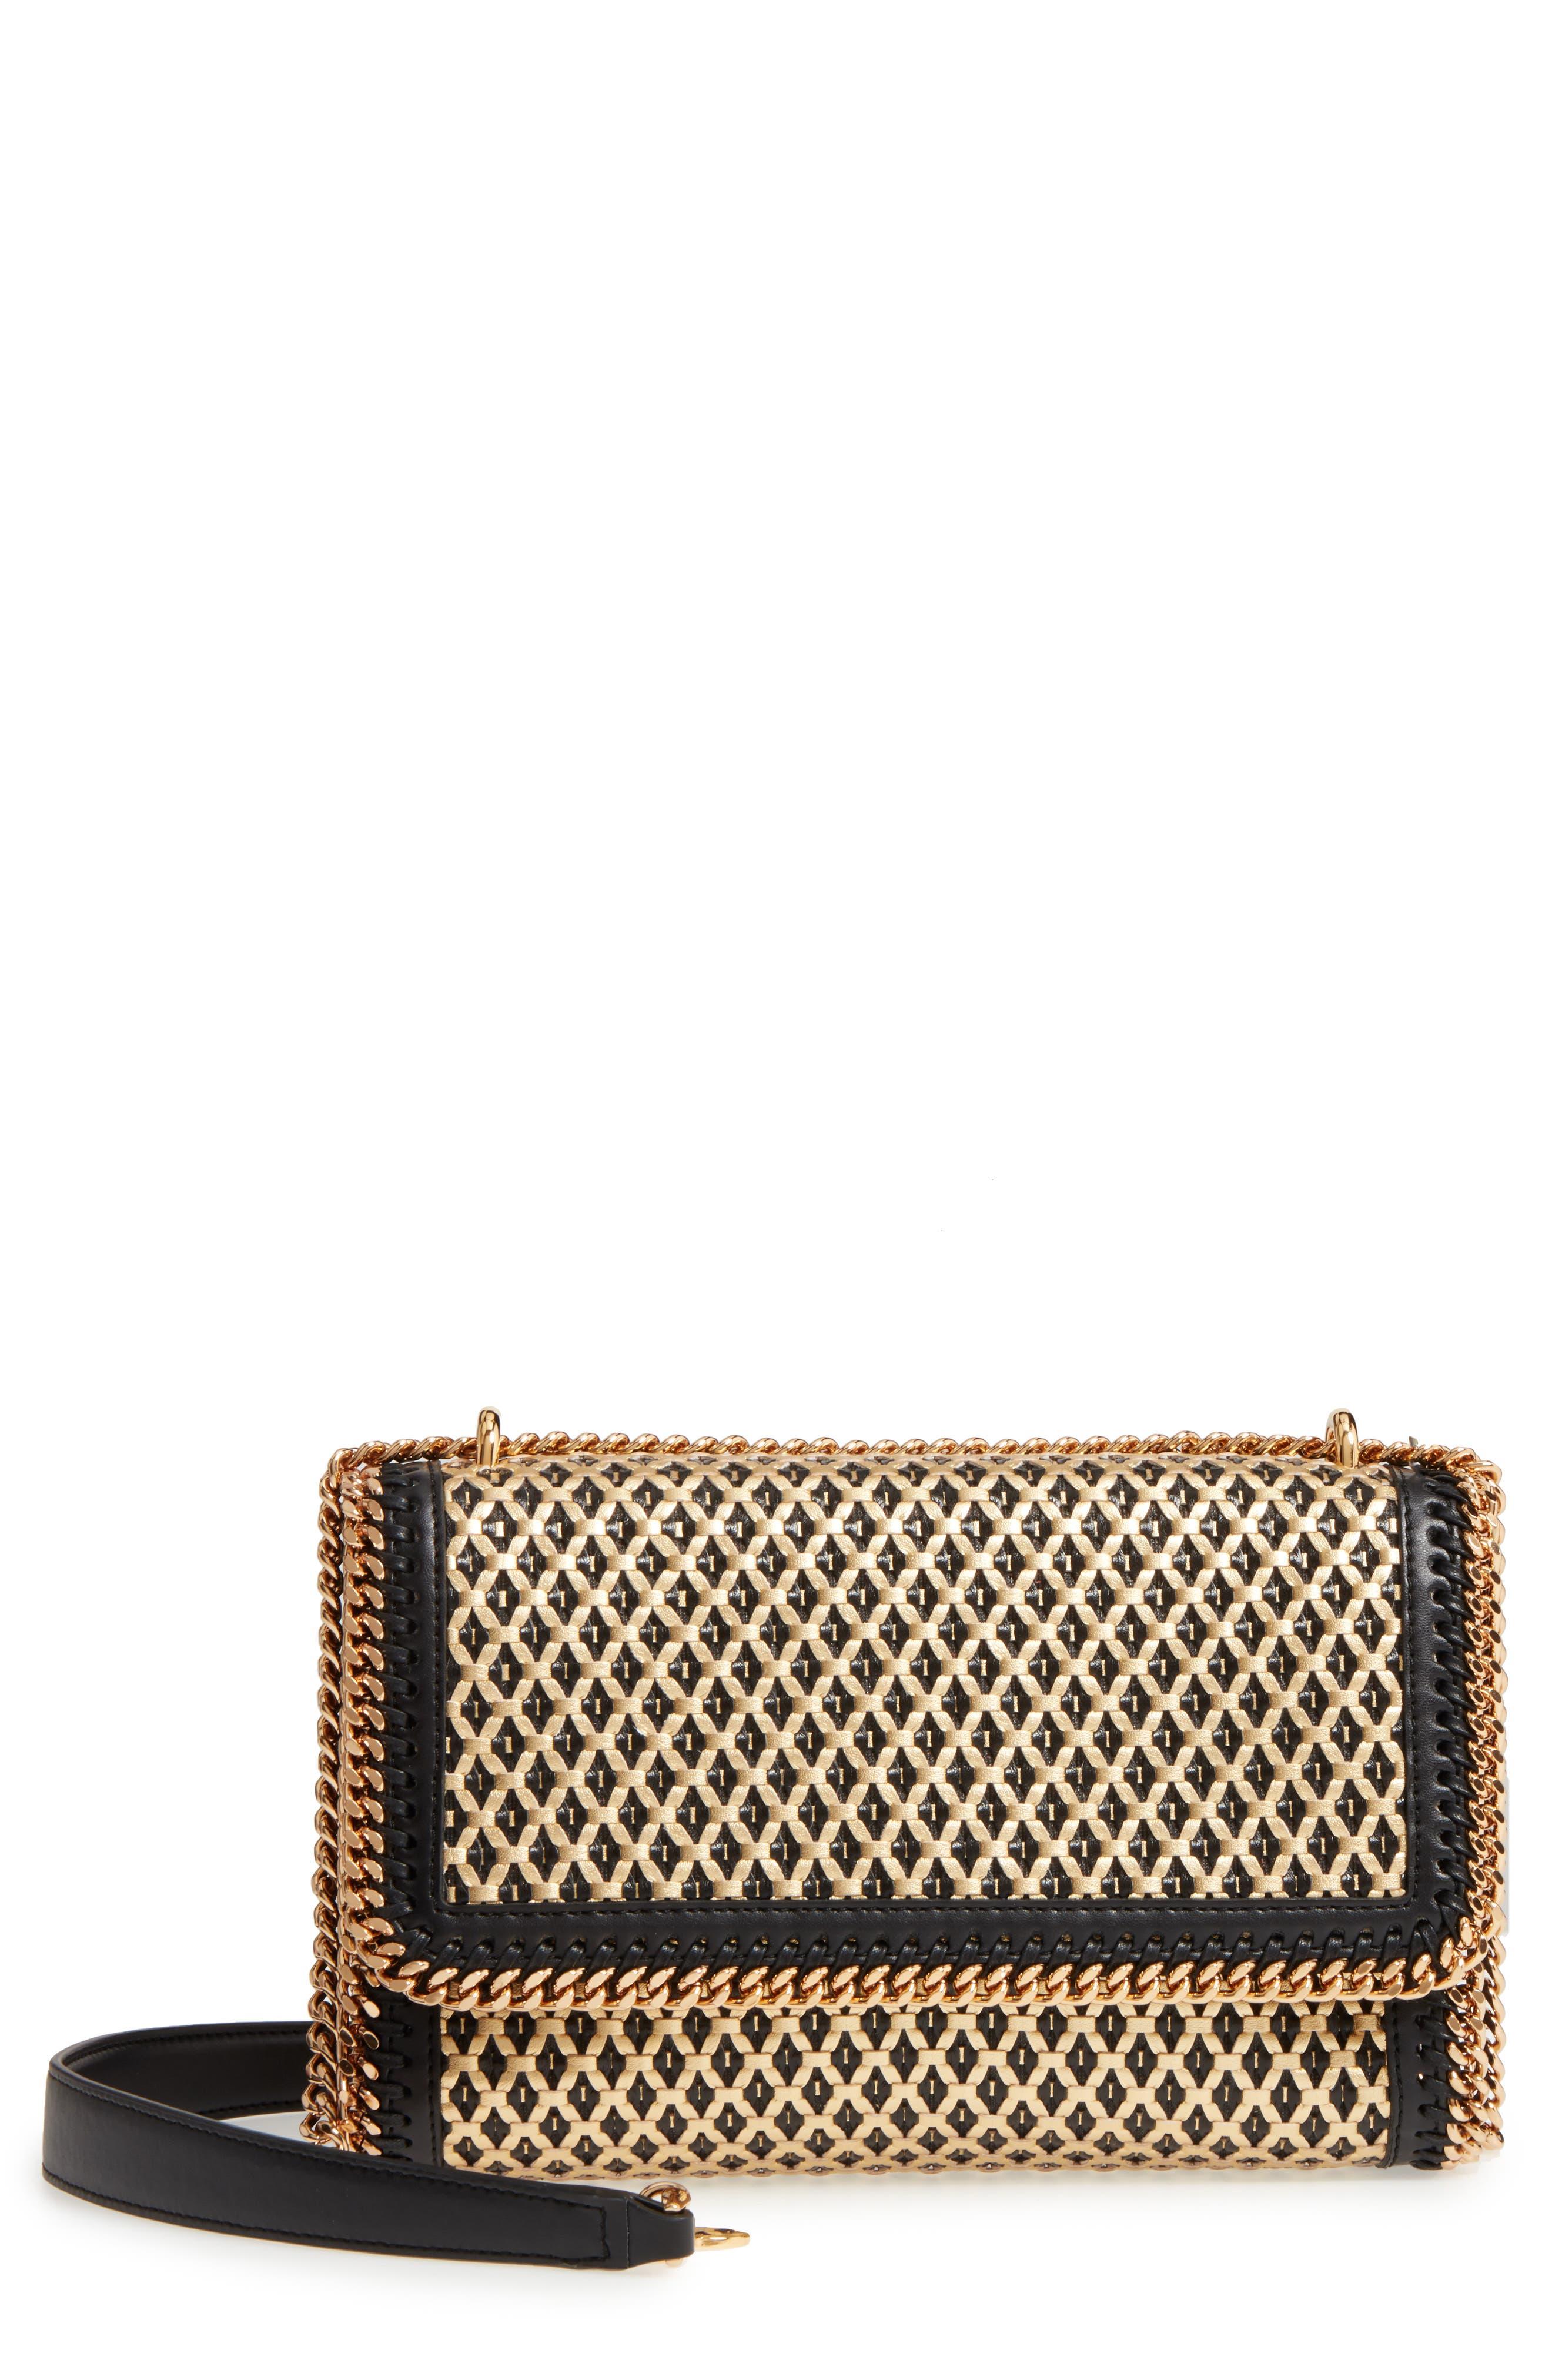 Stella McCartney Woven Faux Leather Flap Shoulder Bag